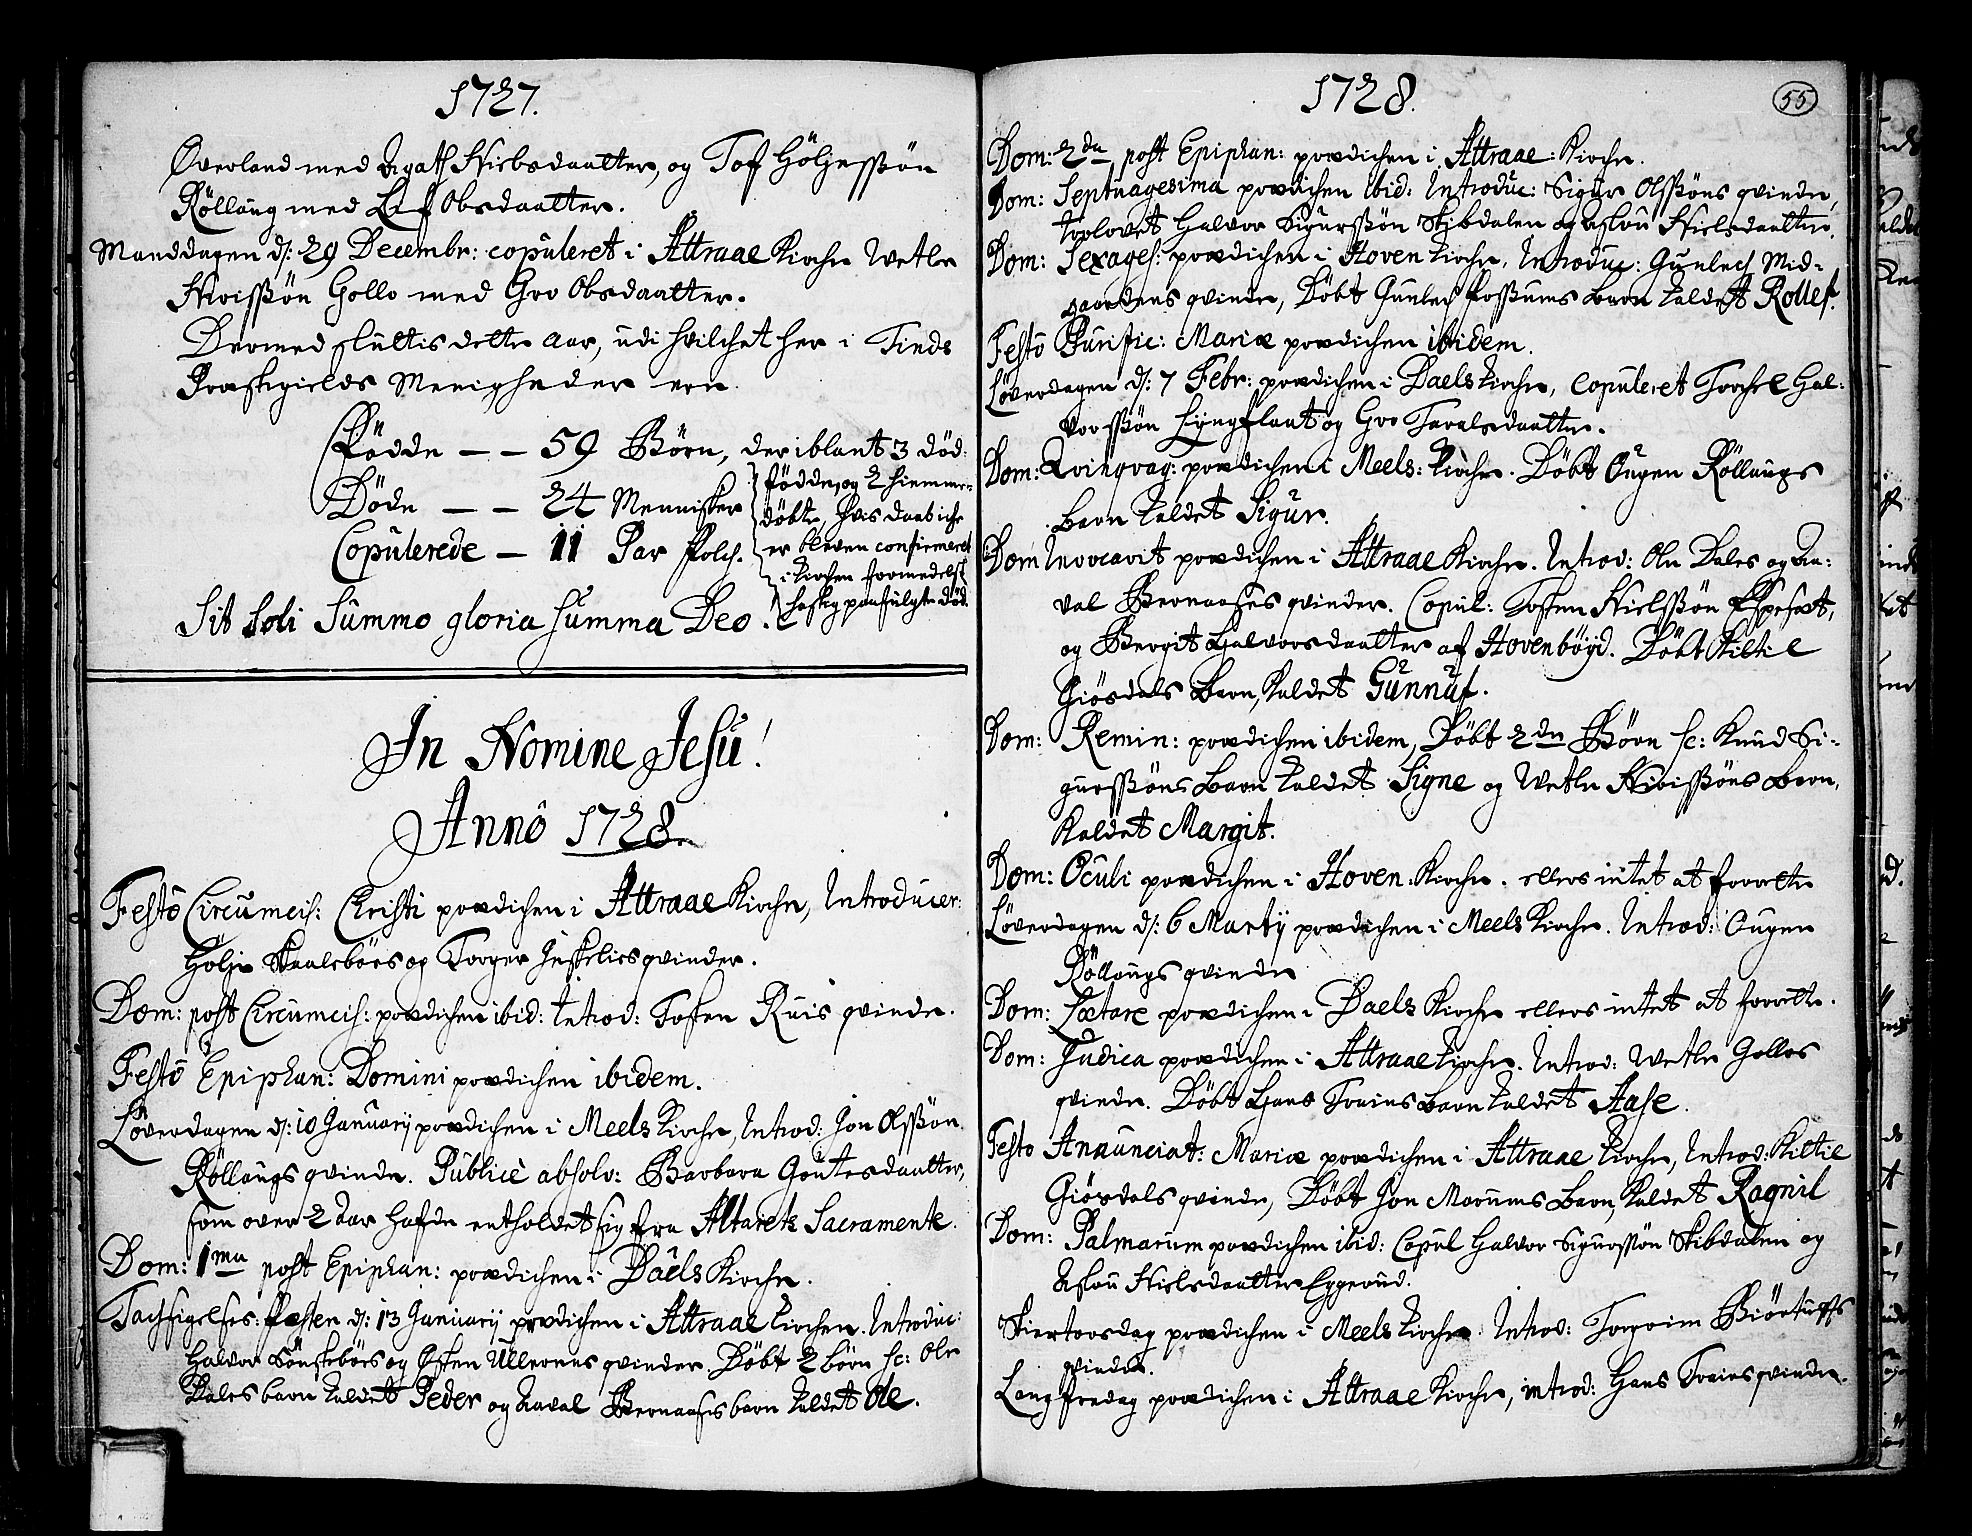 SAKO, Tinn kirkebøker, F/Fa/L0001: Ministerialbok nr. I 1, 1717-1734, s. 55